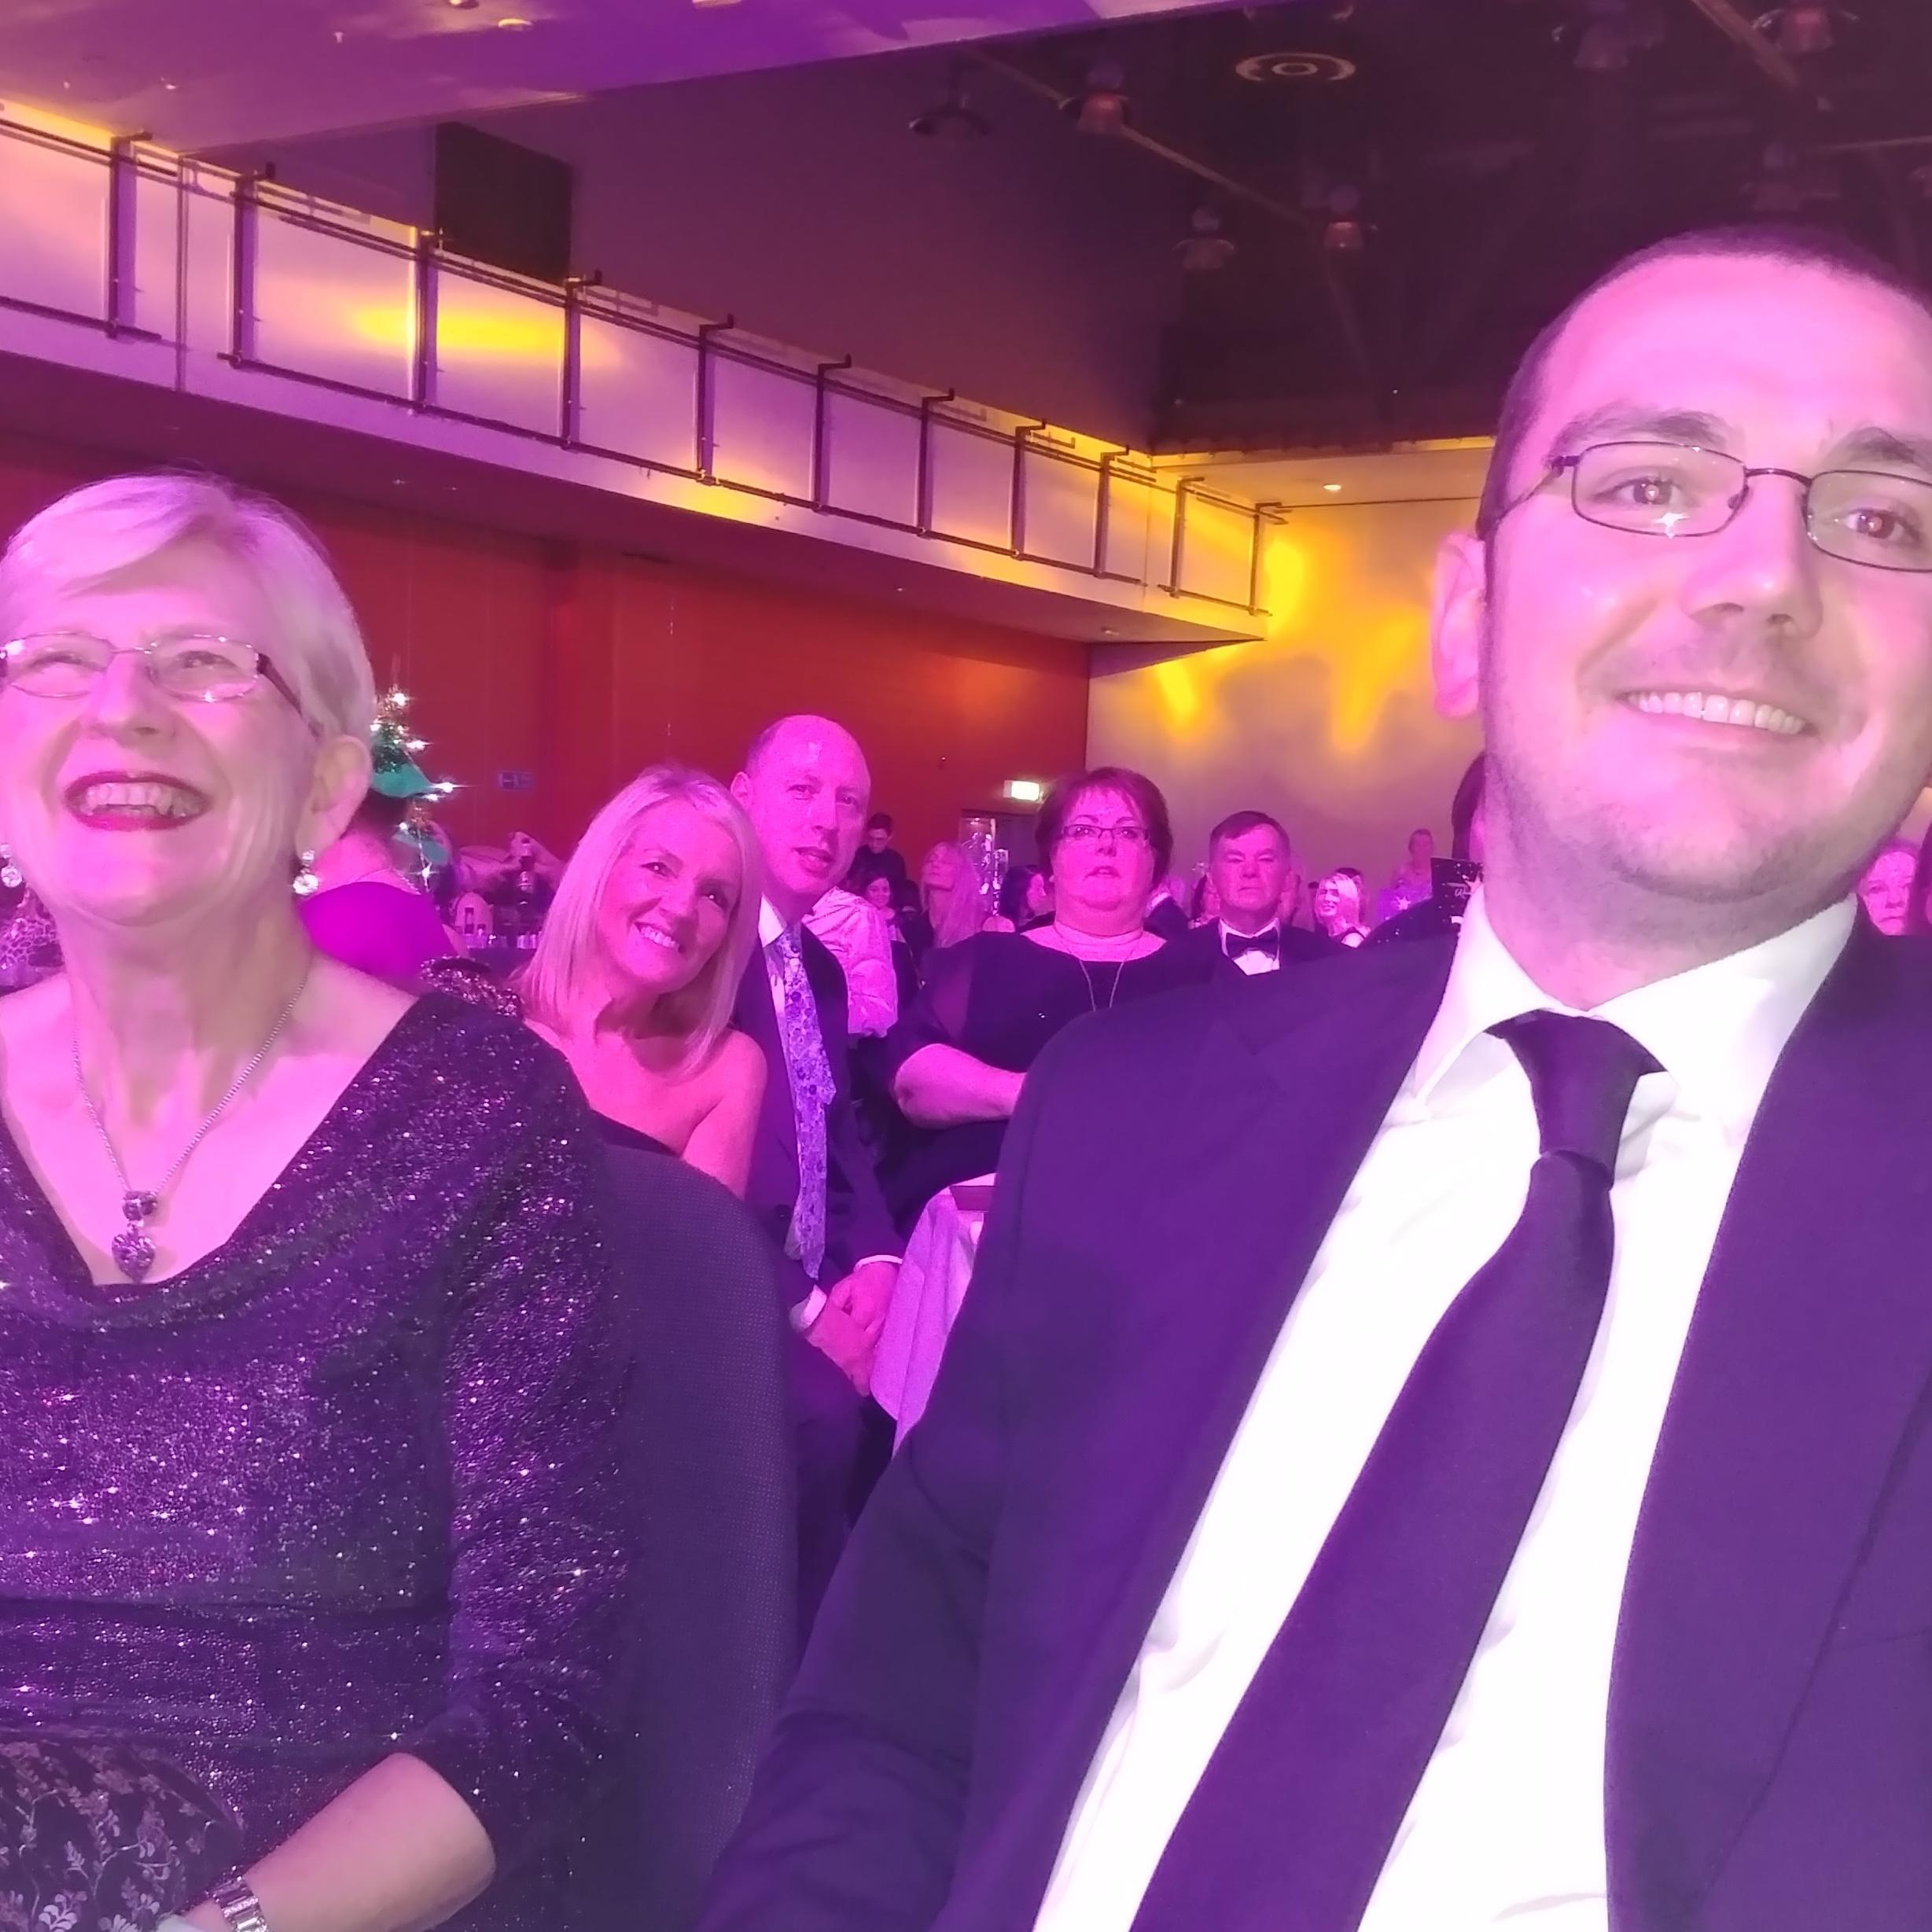 Photo of Lesley Webber at awards ceremony